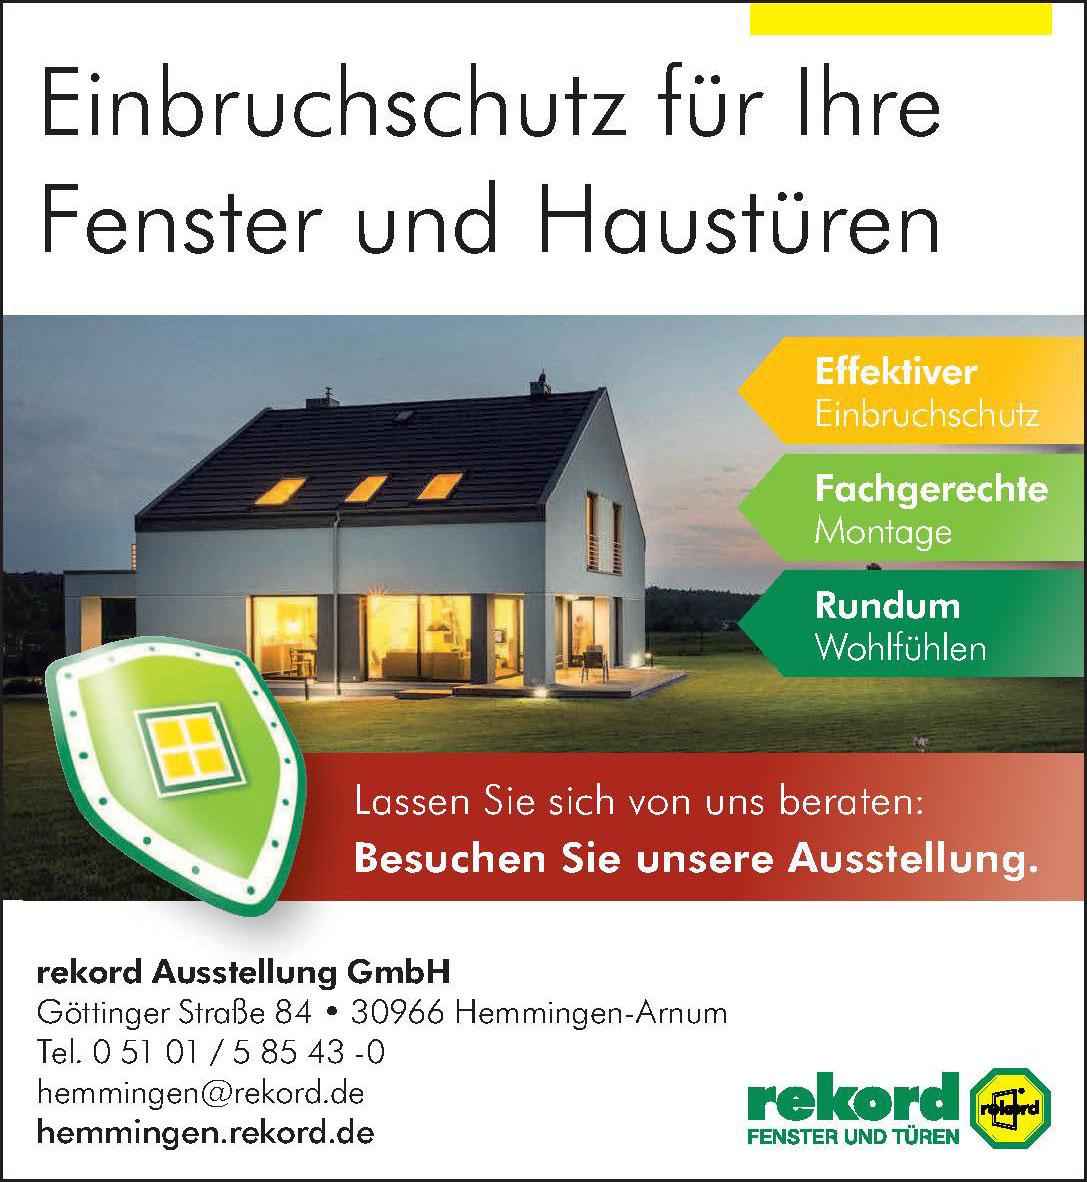 rekord Ausstellung GmbH